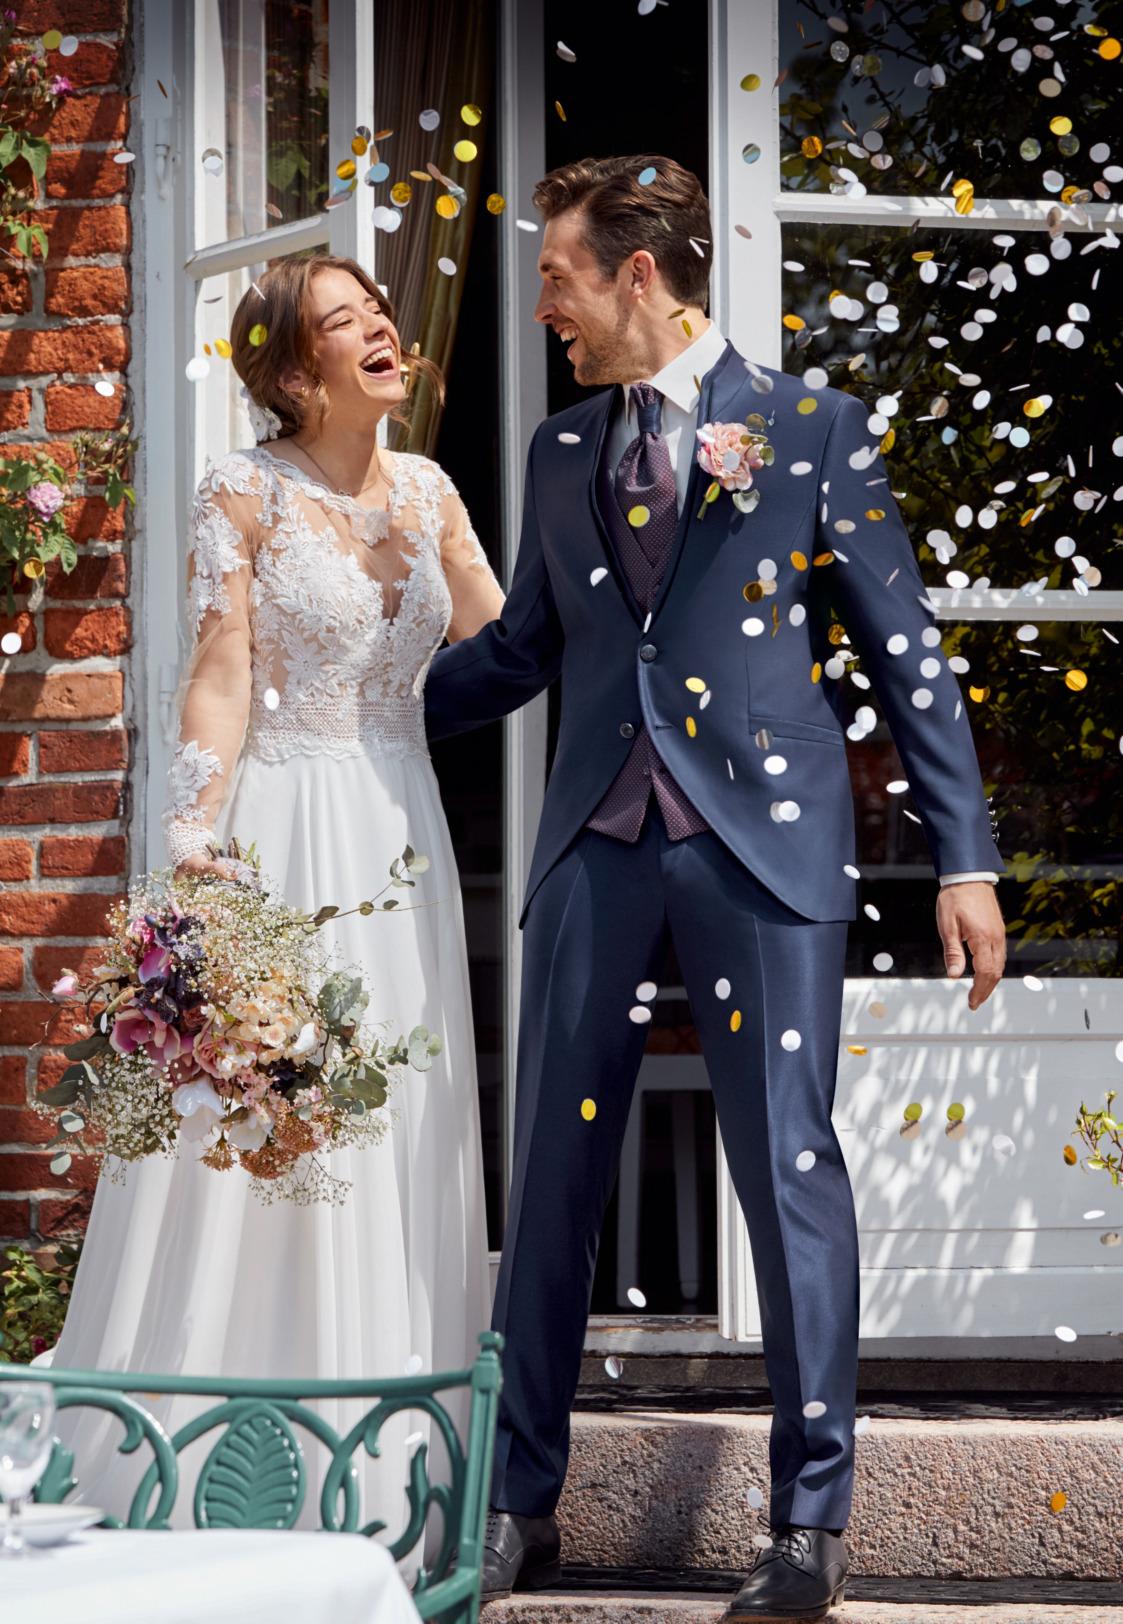 Wilvorst After Six Hochzeitsanzug Männer Mode Bräutigam klassische Form blau wil_0121_kam_as-look-1_1